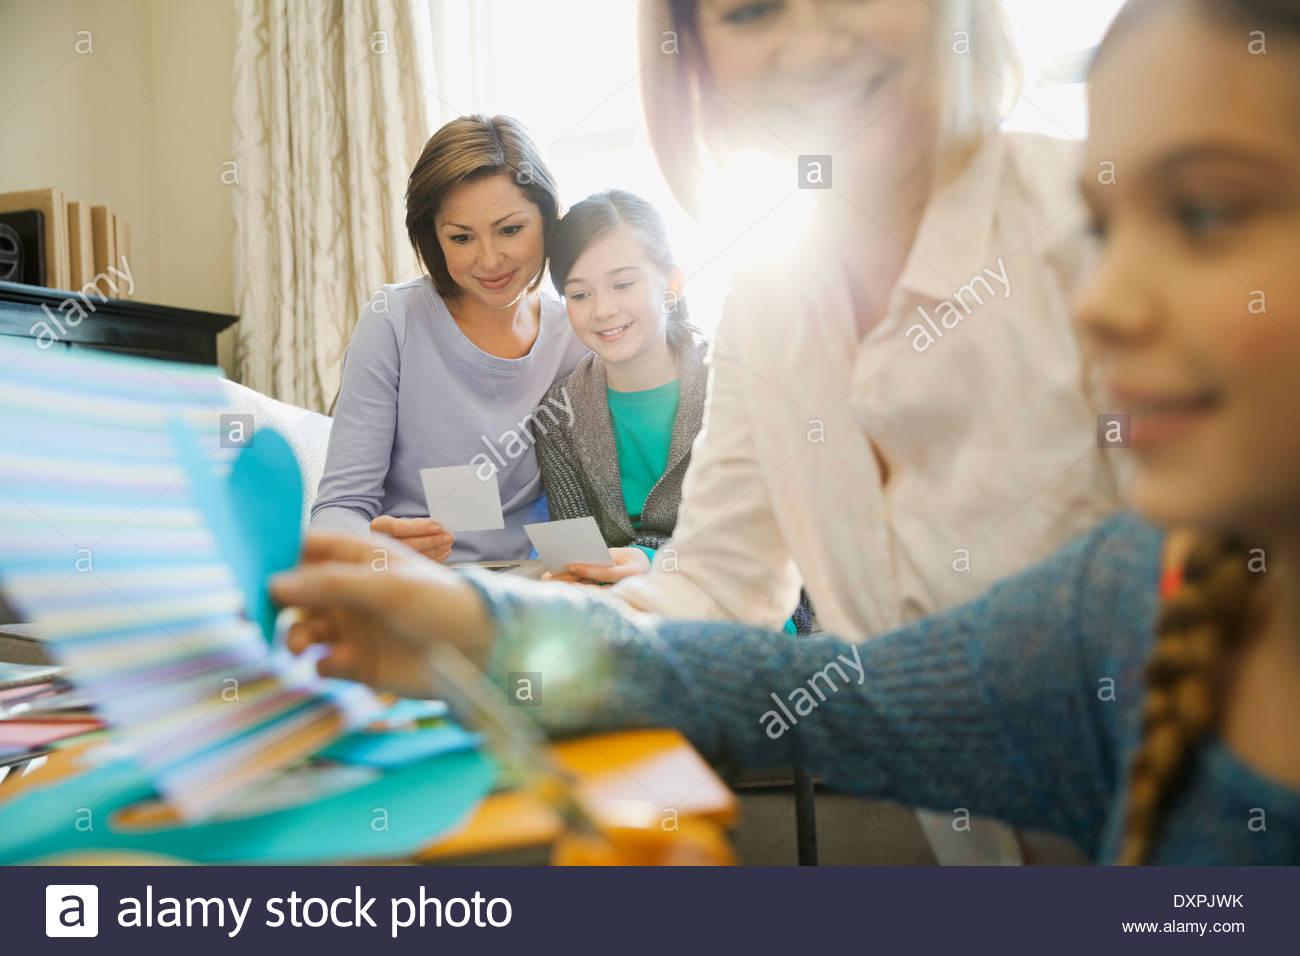 Smiling mother and daughter regarder des photos tout en scrapbooking Photo Stock